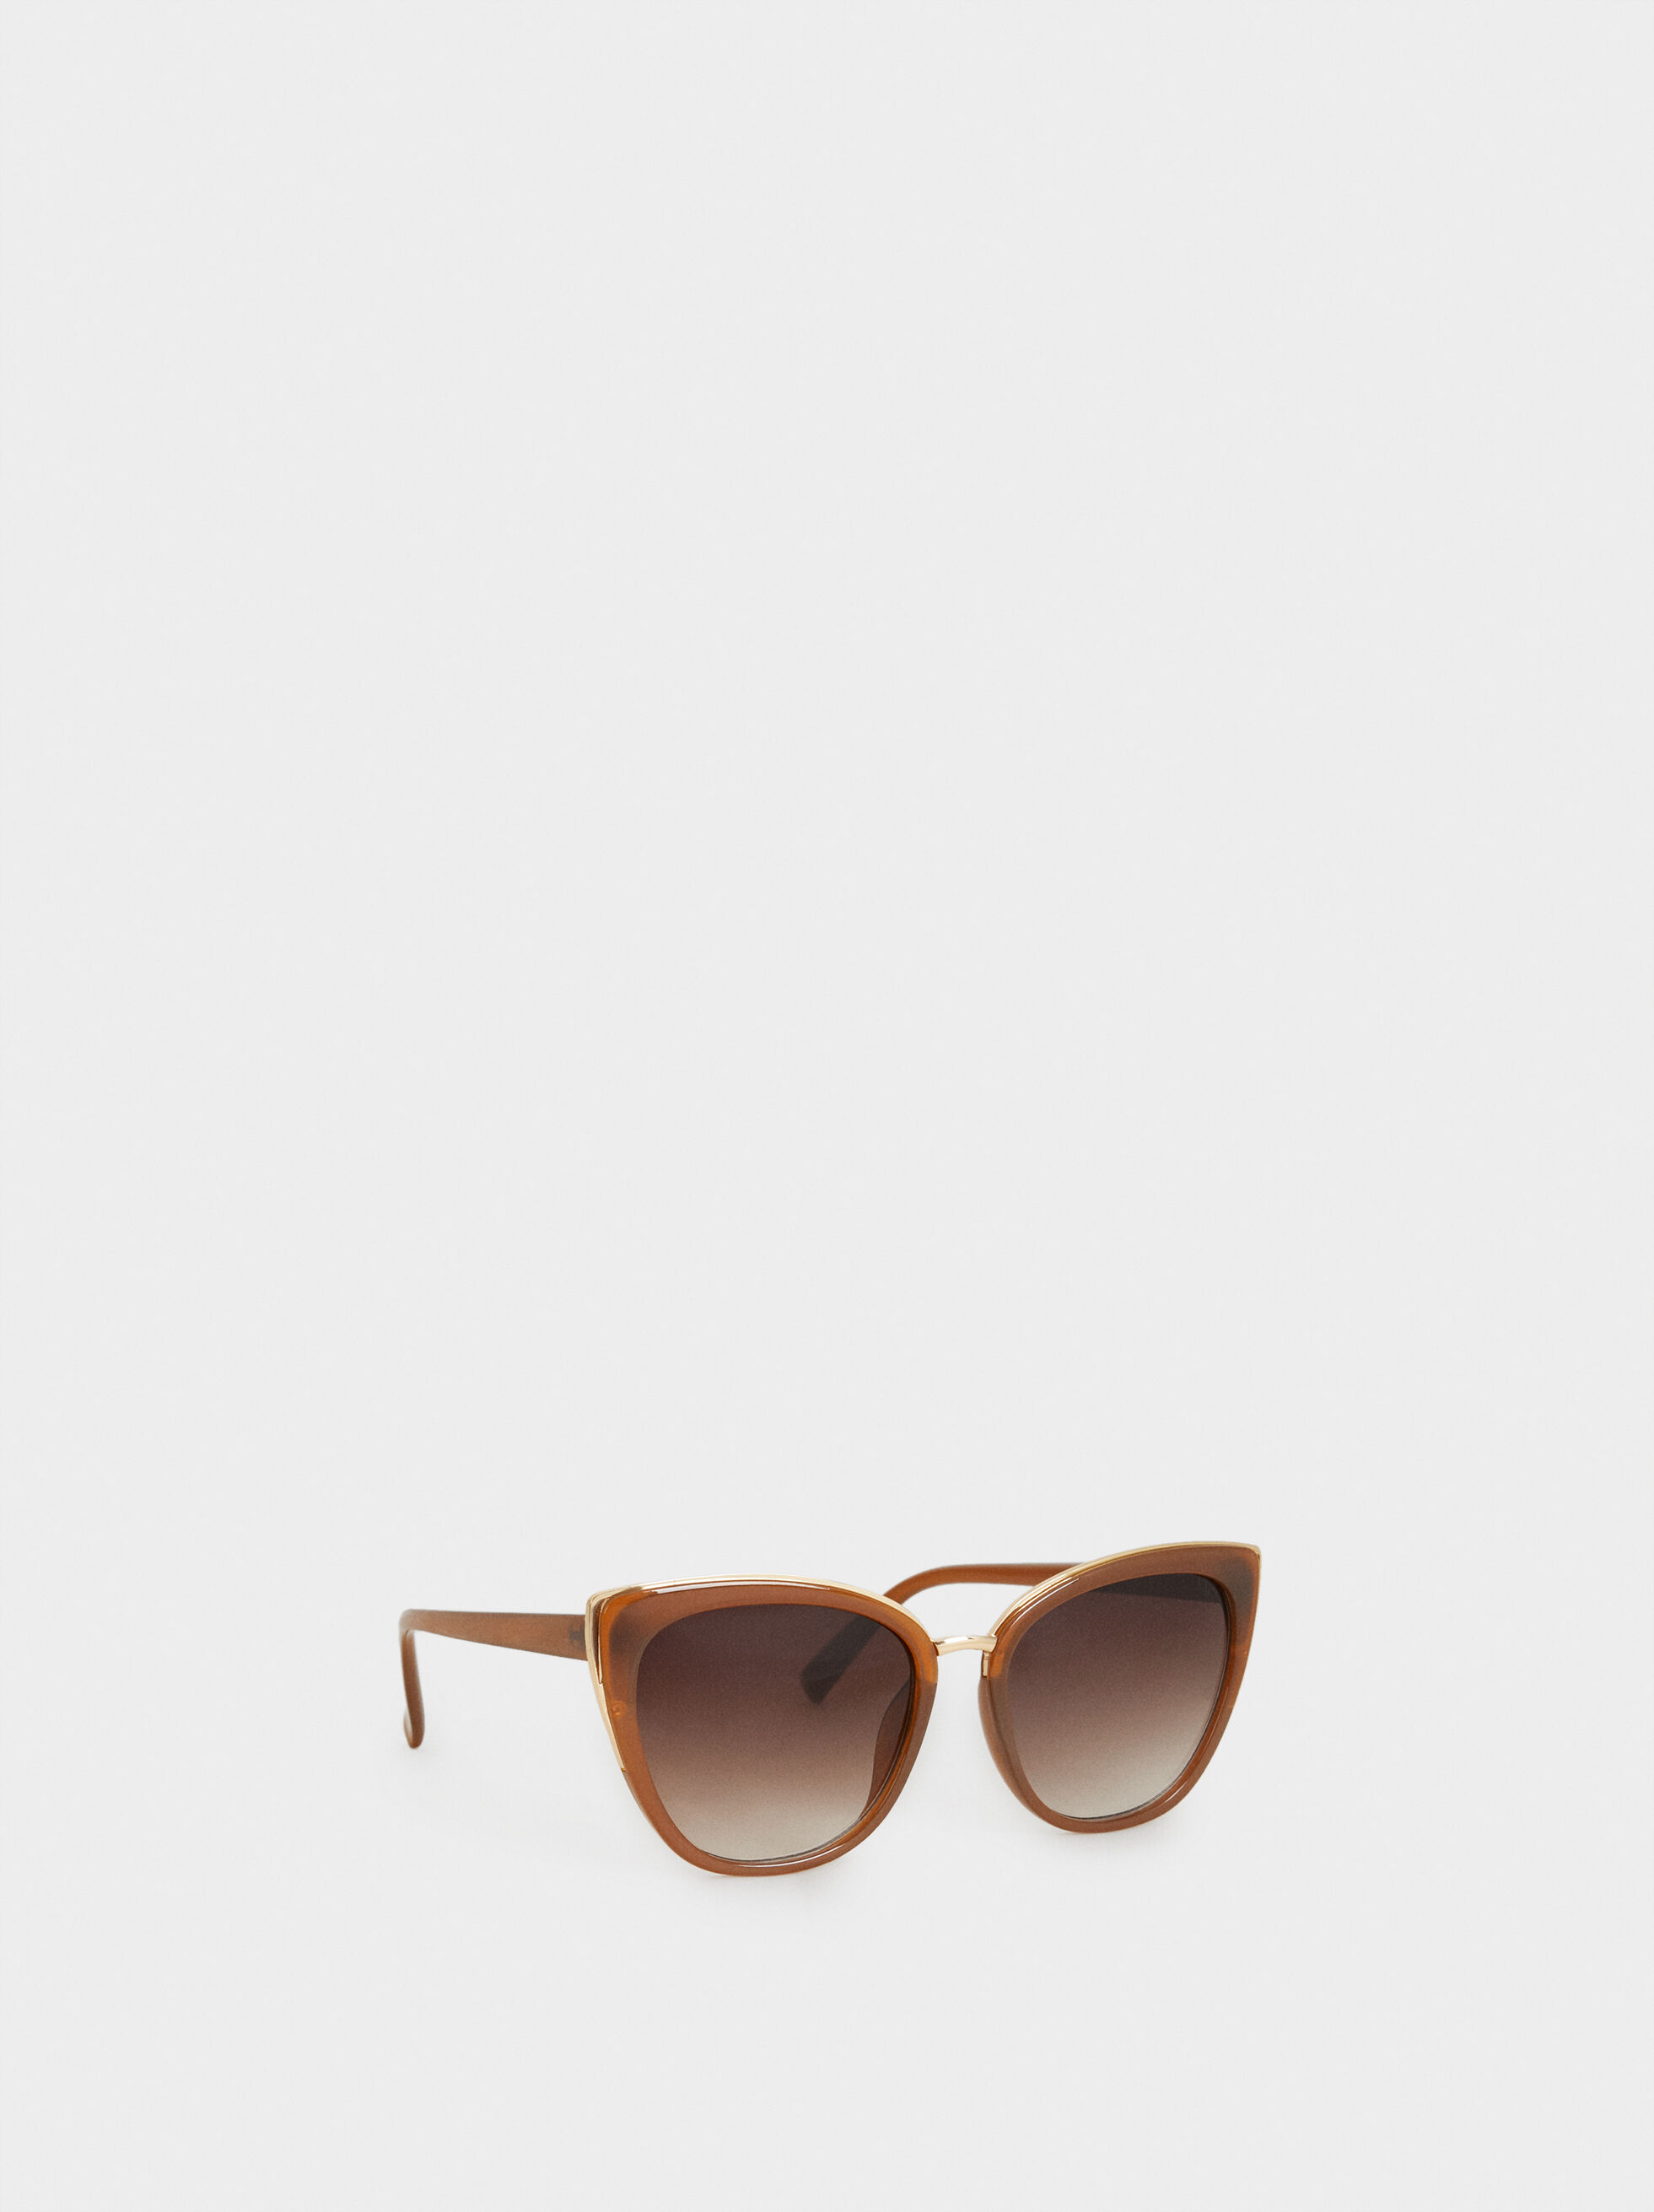 Cateye Sunglasses, Camel, hi-res